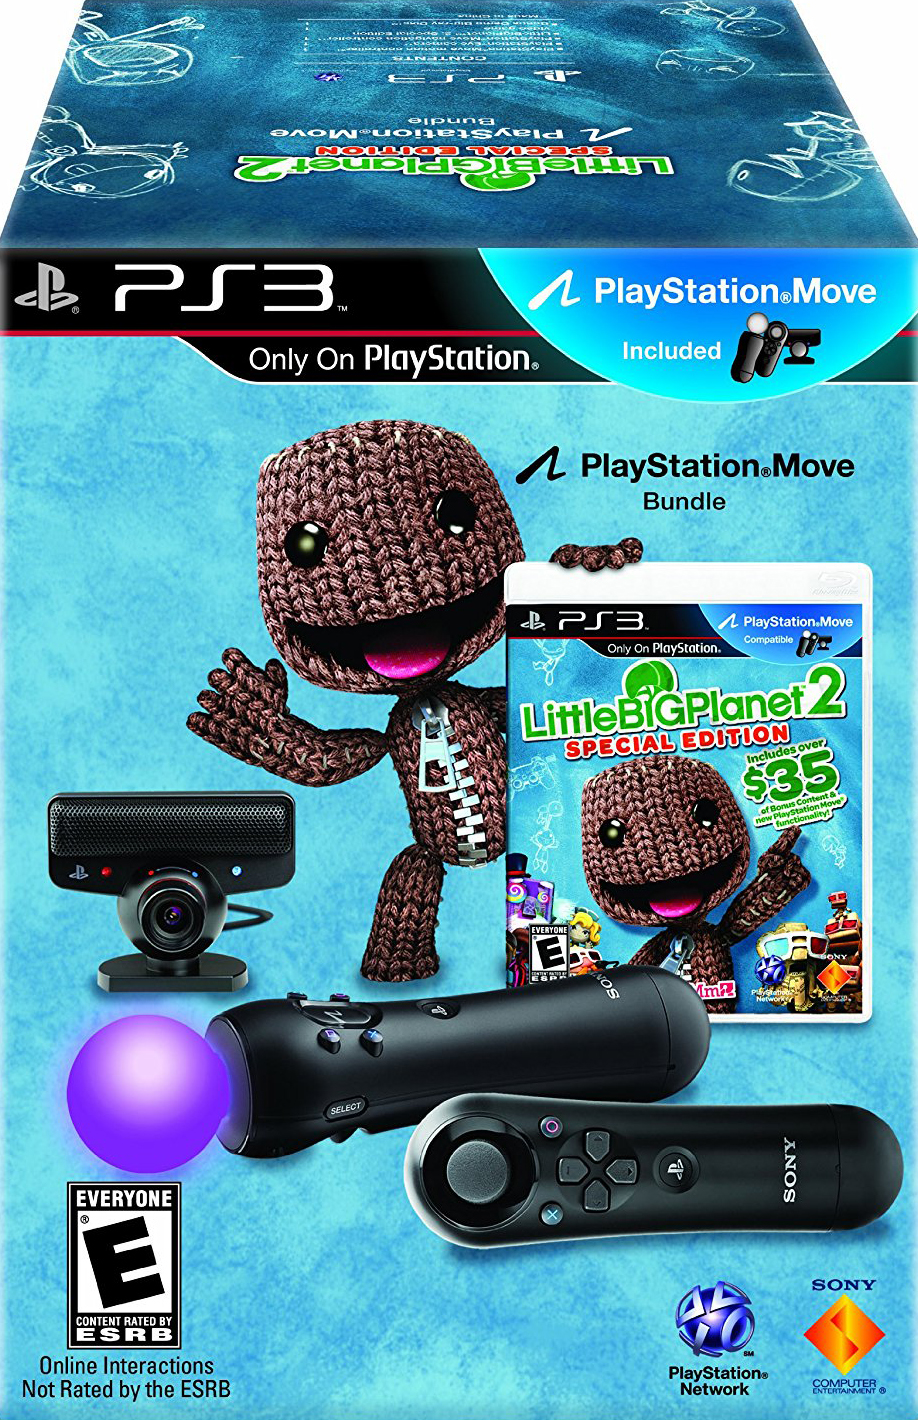 LittleBigPlanet 2 Special Edition Move Bundle